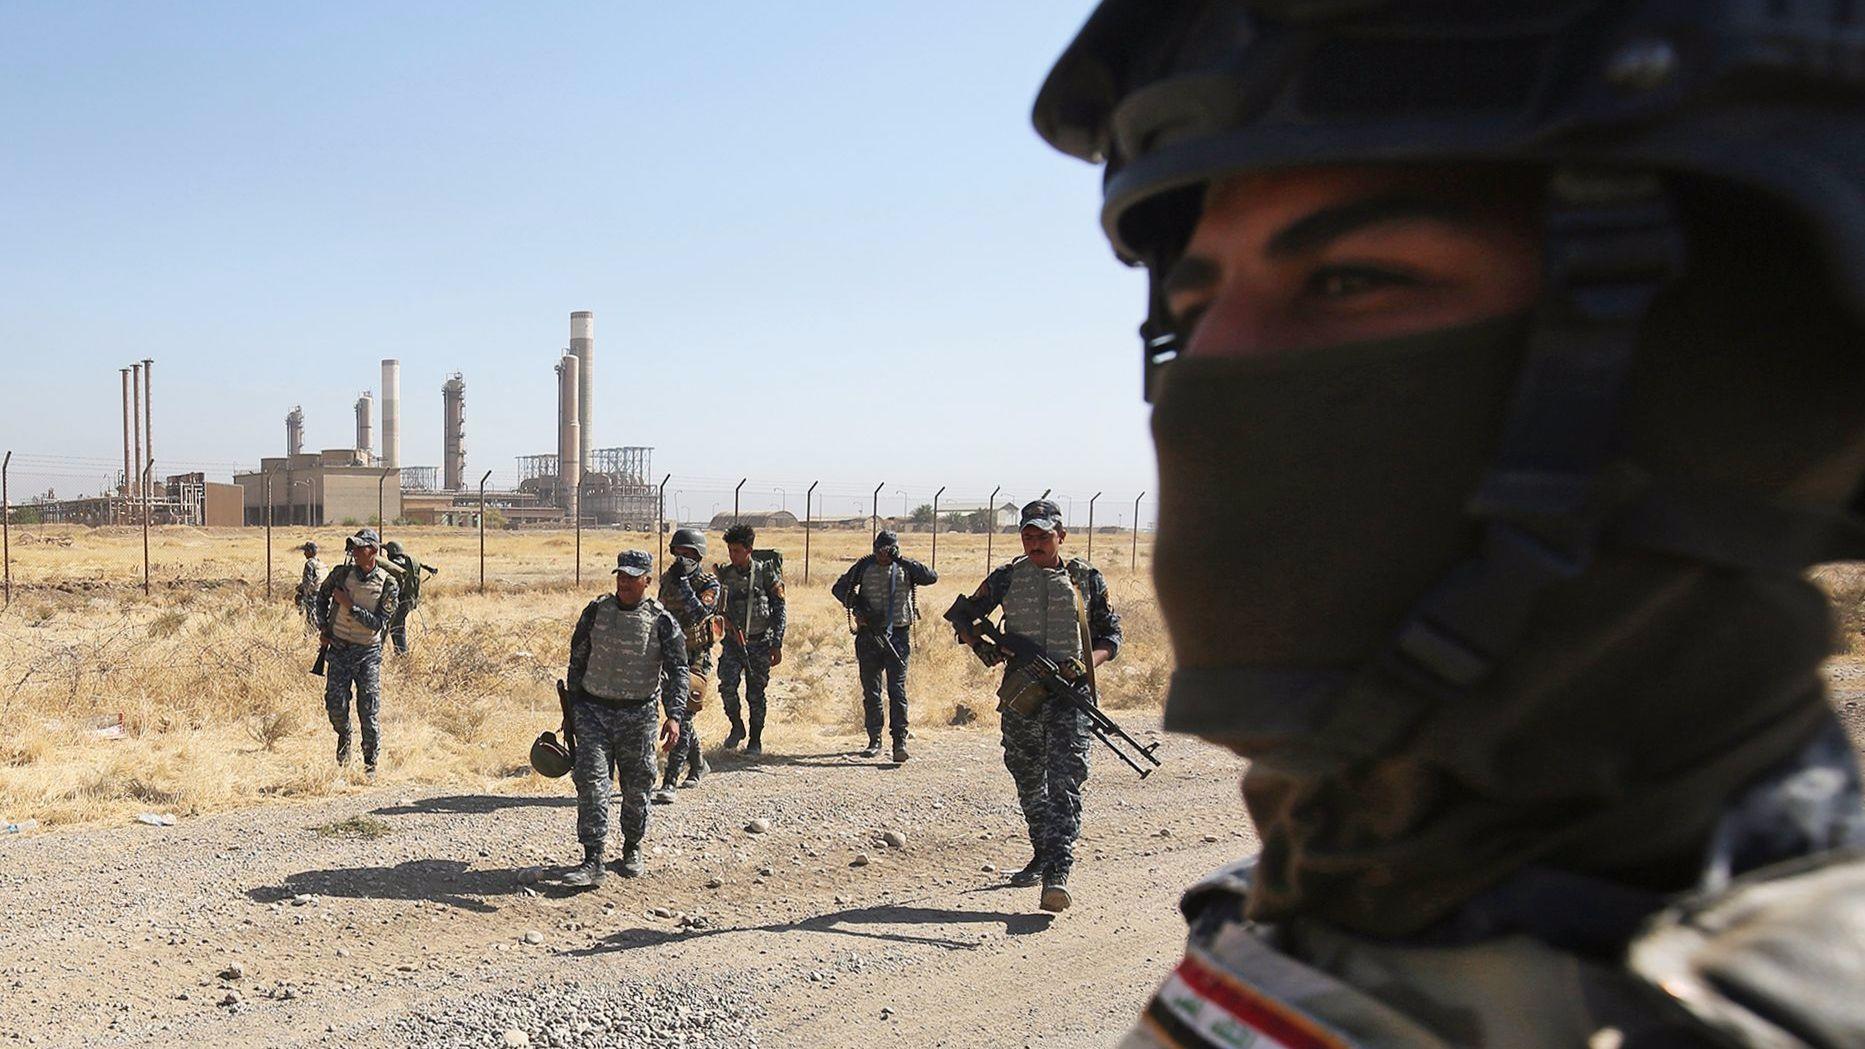 Clashes around oil-rich Kirkuk raise specter of a new civil war in Iraq